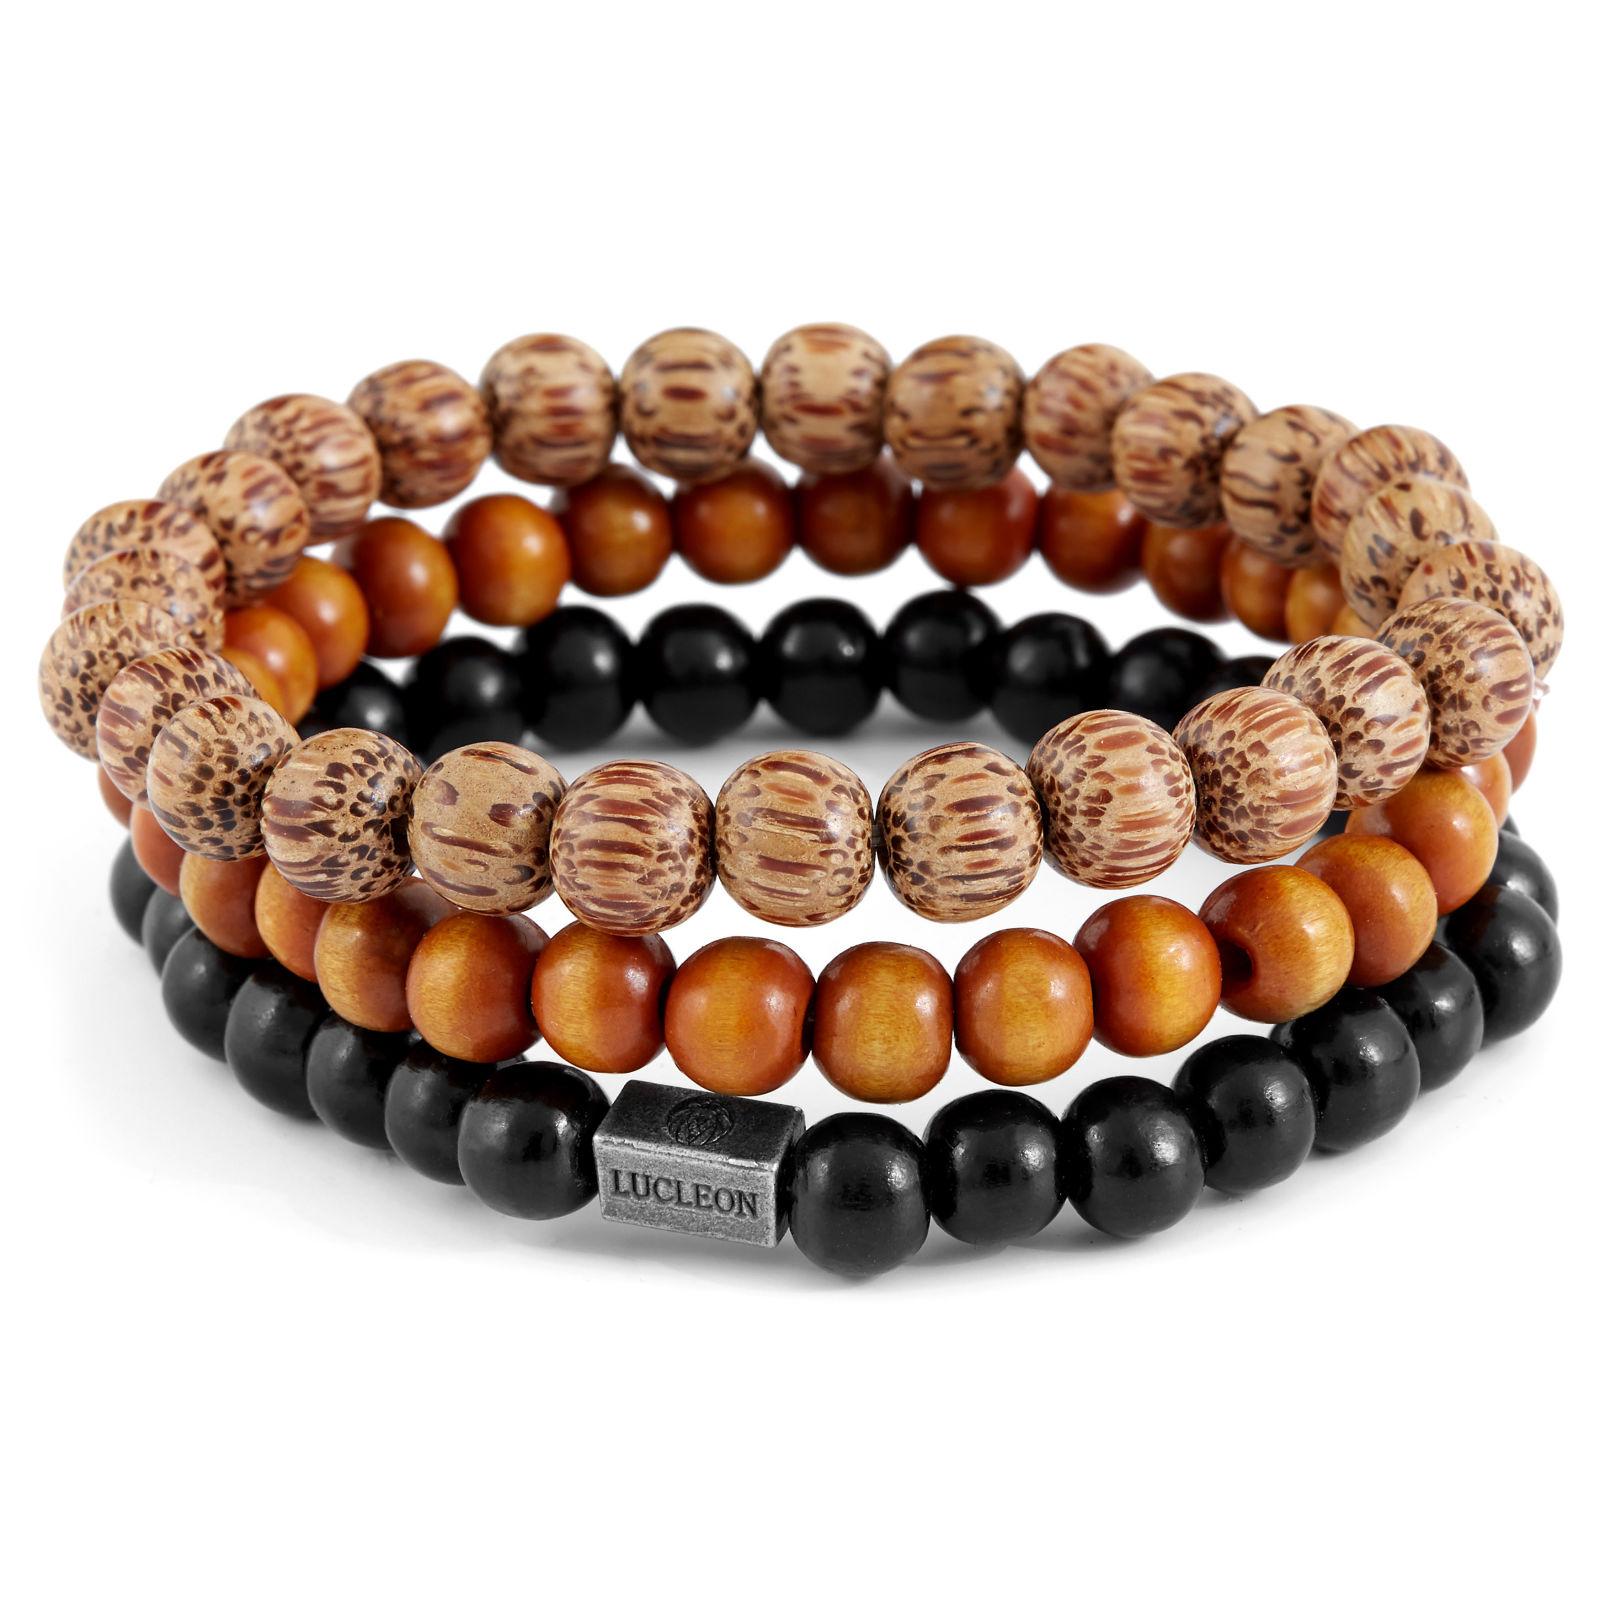 Voorkeur Zwarte en Bruine Armband | Lucleon | Op voorraad @WF01